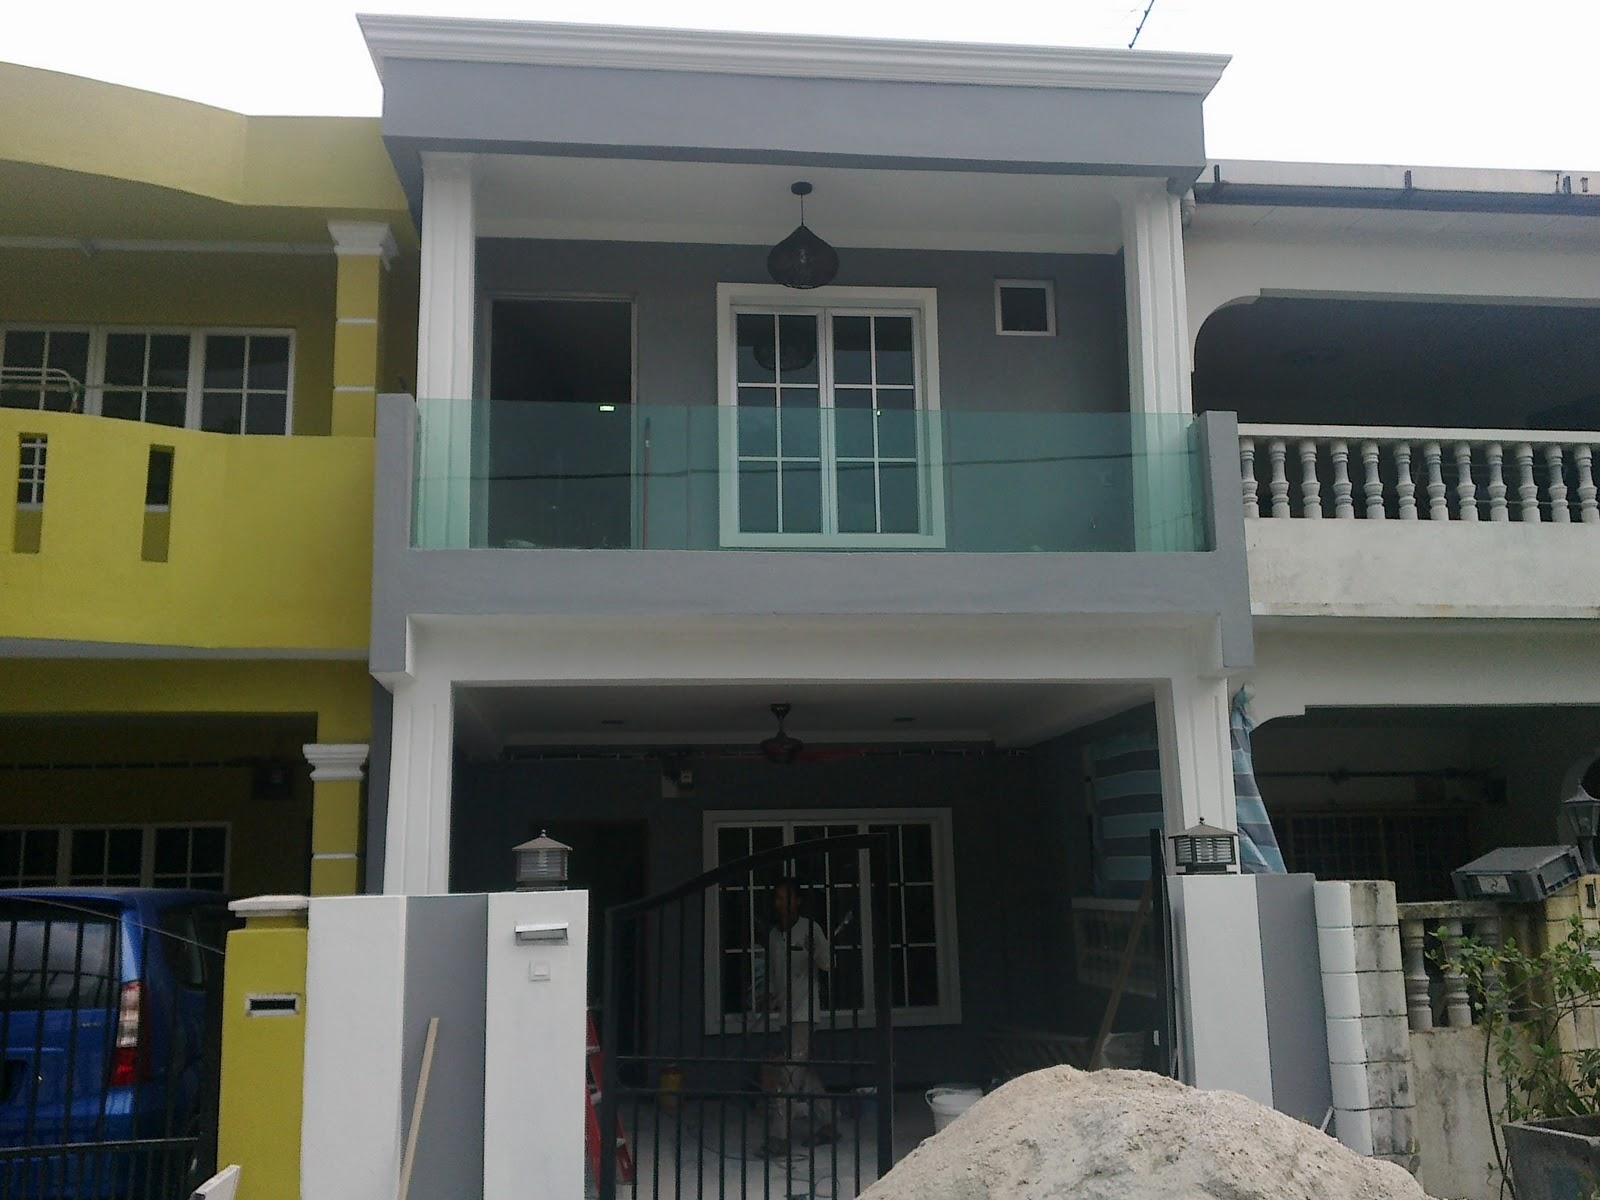 Reesha Home Renovation Penambahan Bahagian Depan Dan Atas & Ubahsuai Rumah Teres 2 Tingkat | Desainrumahid.com